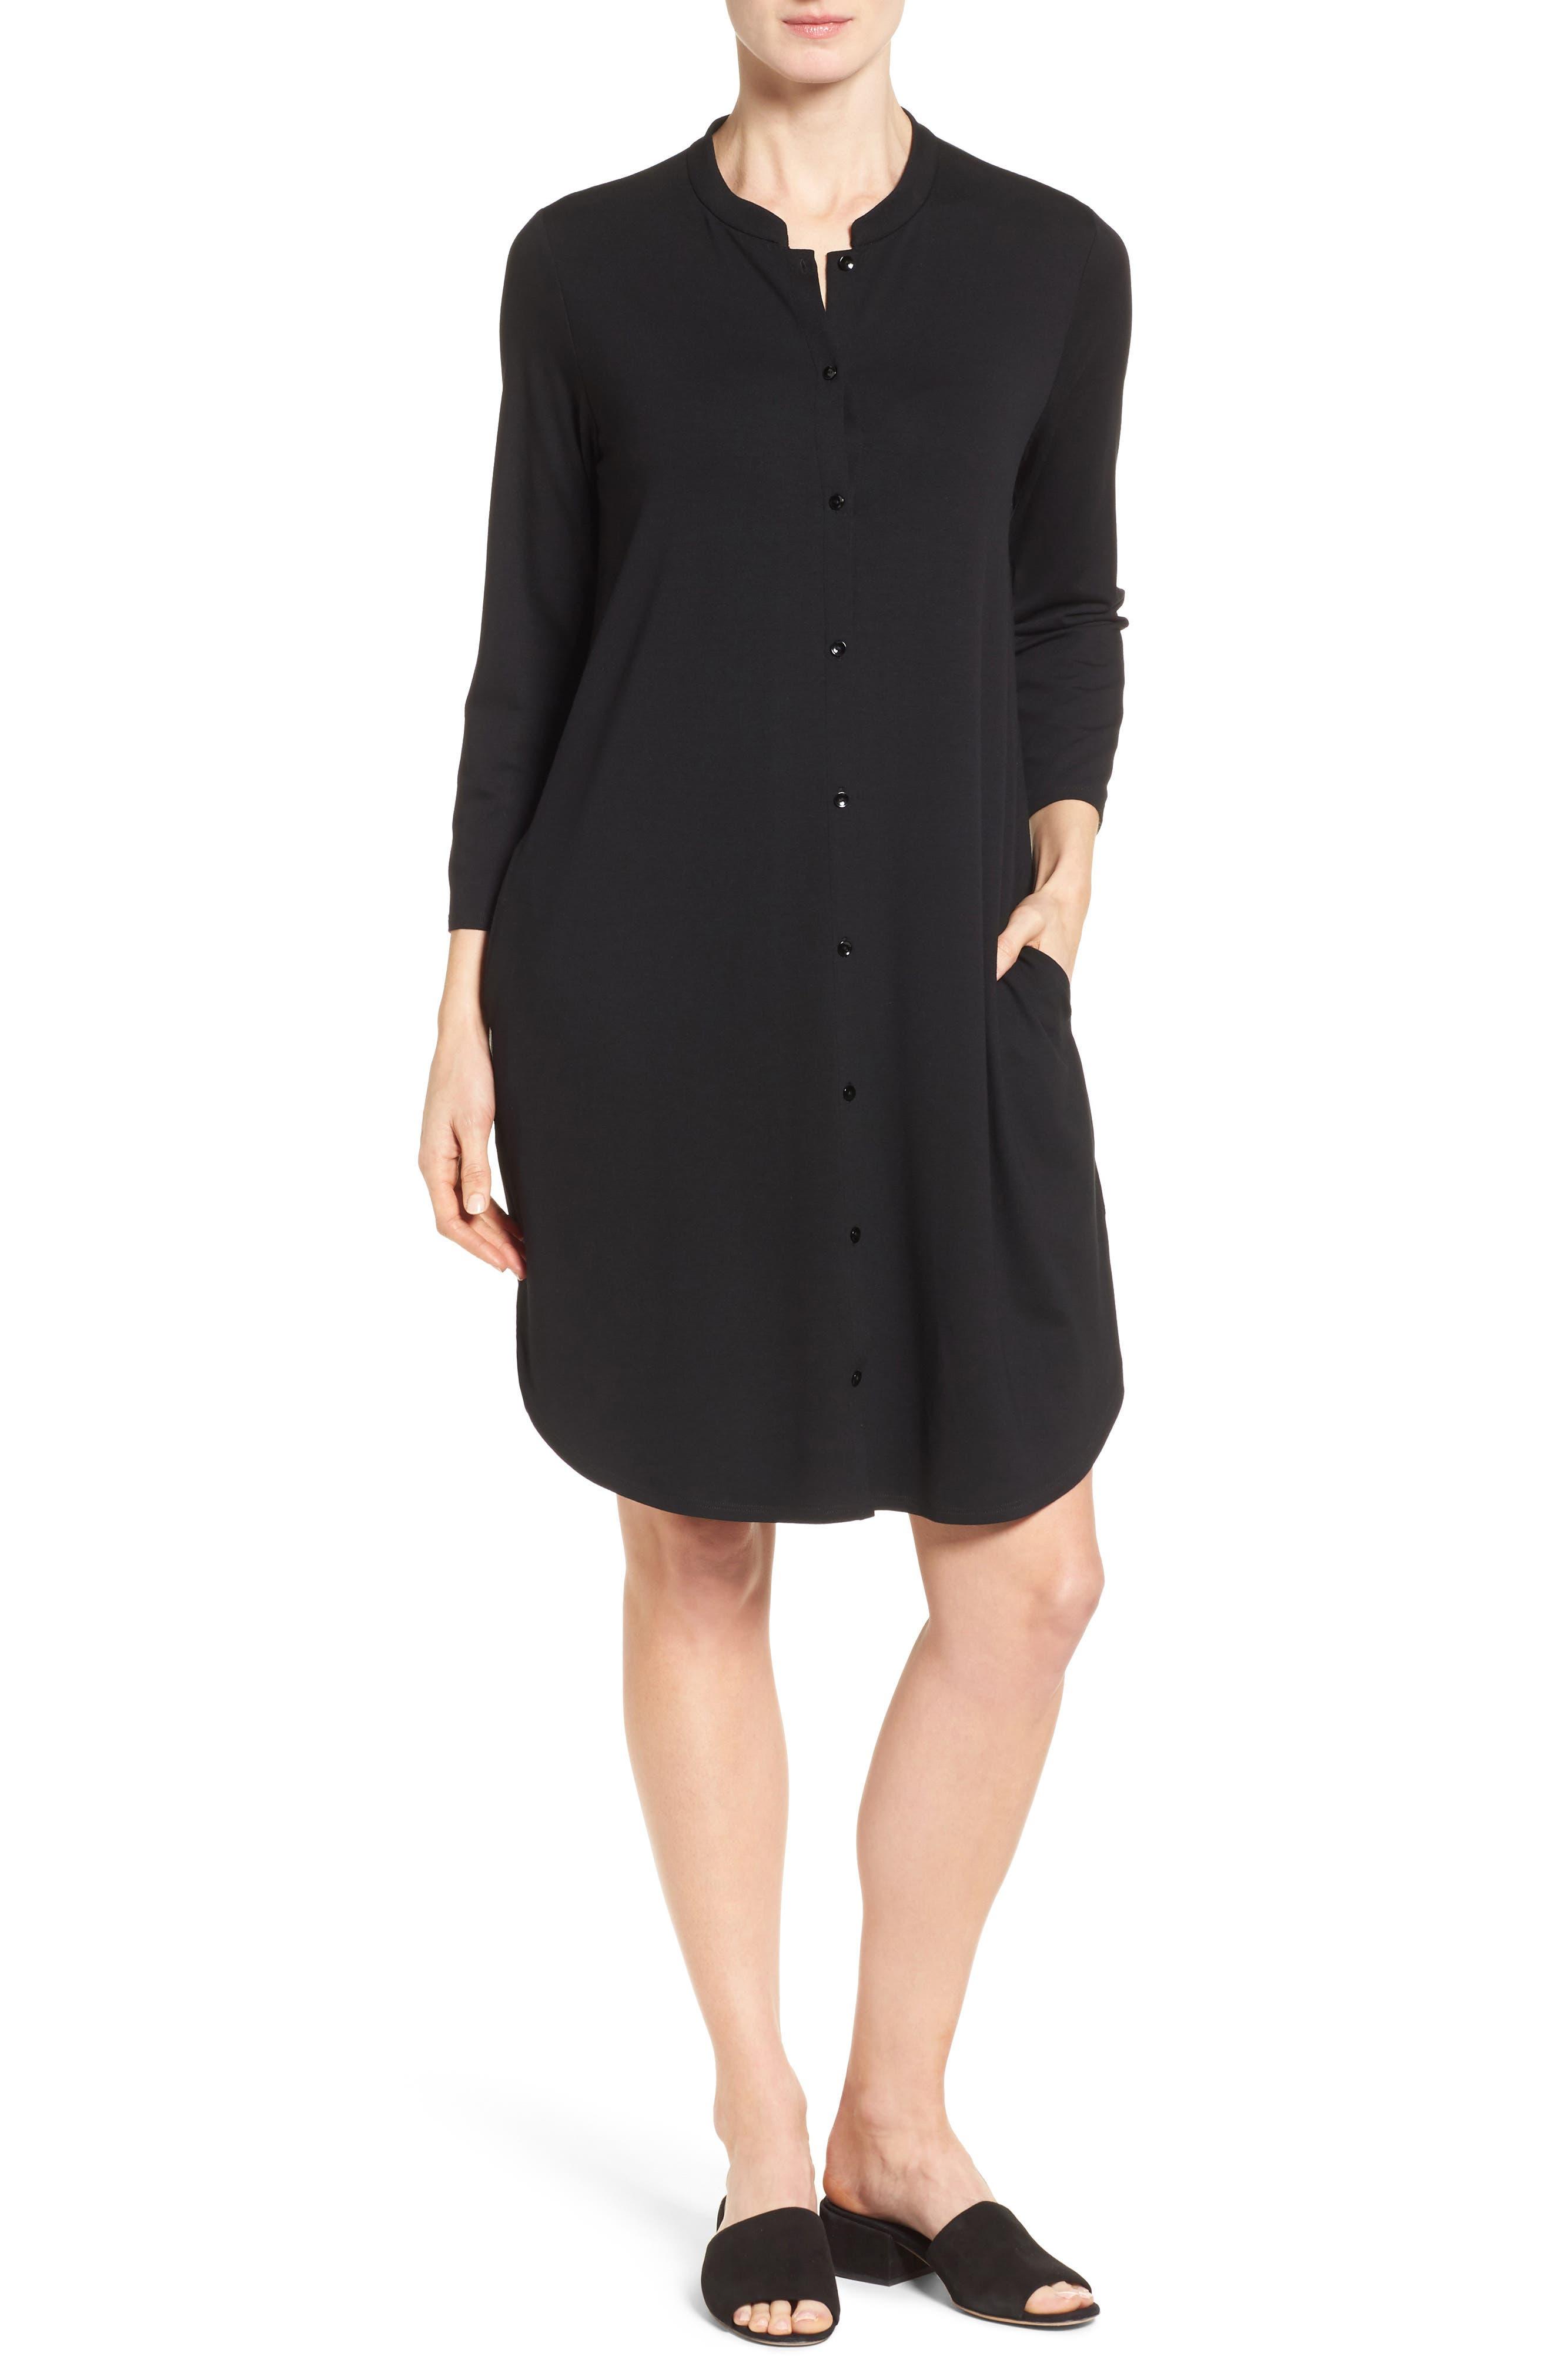 Alternate Image 1 Selected - Eileen Fisher Mandarin Collar Jersey Shirtdress (Regular & Petite)